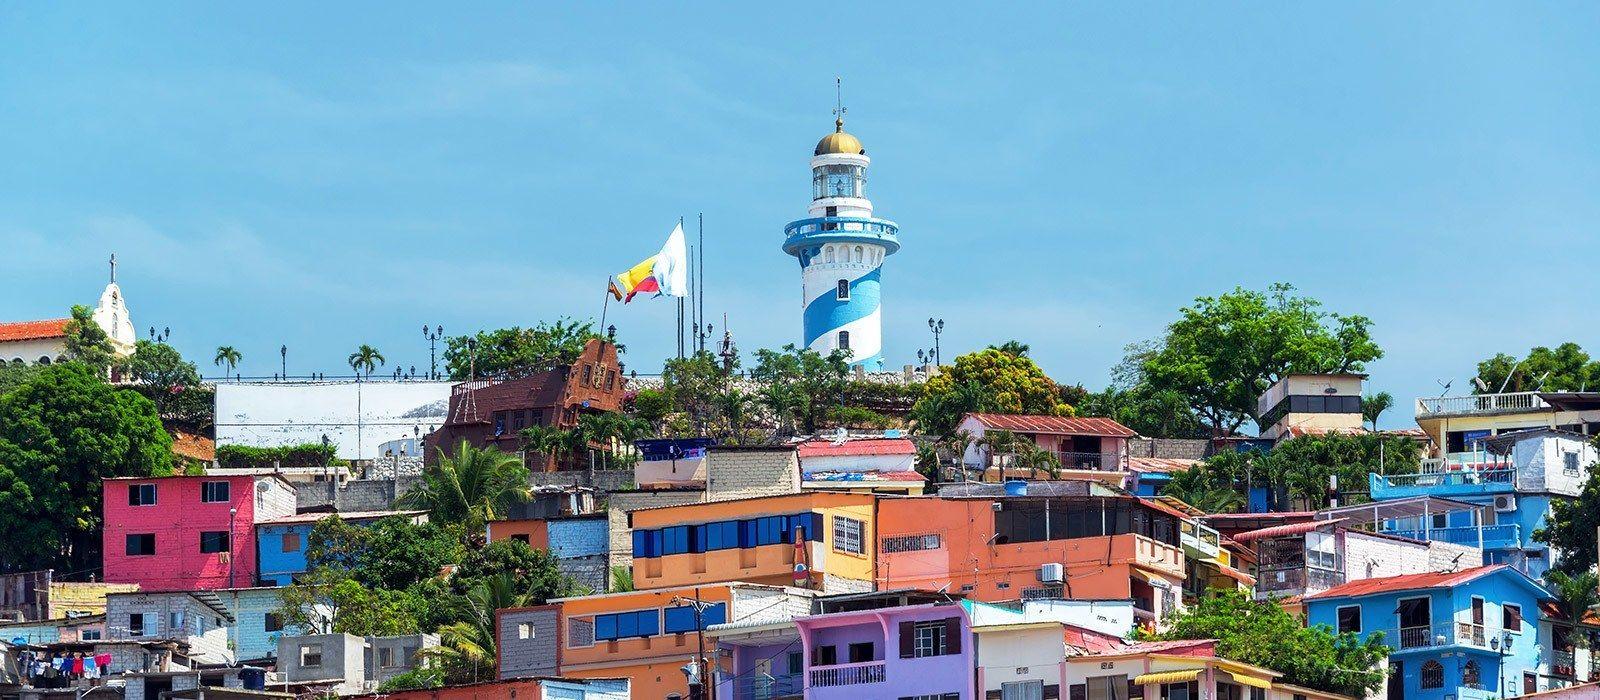 Reiseziel Guayaquil Ecuador/Galapagos